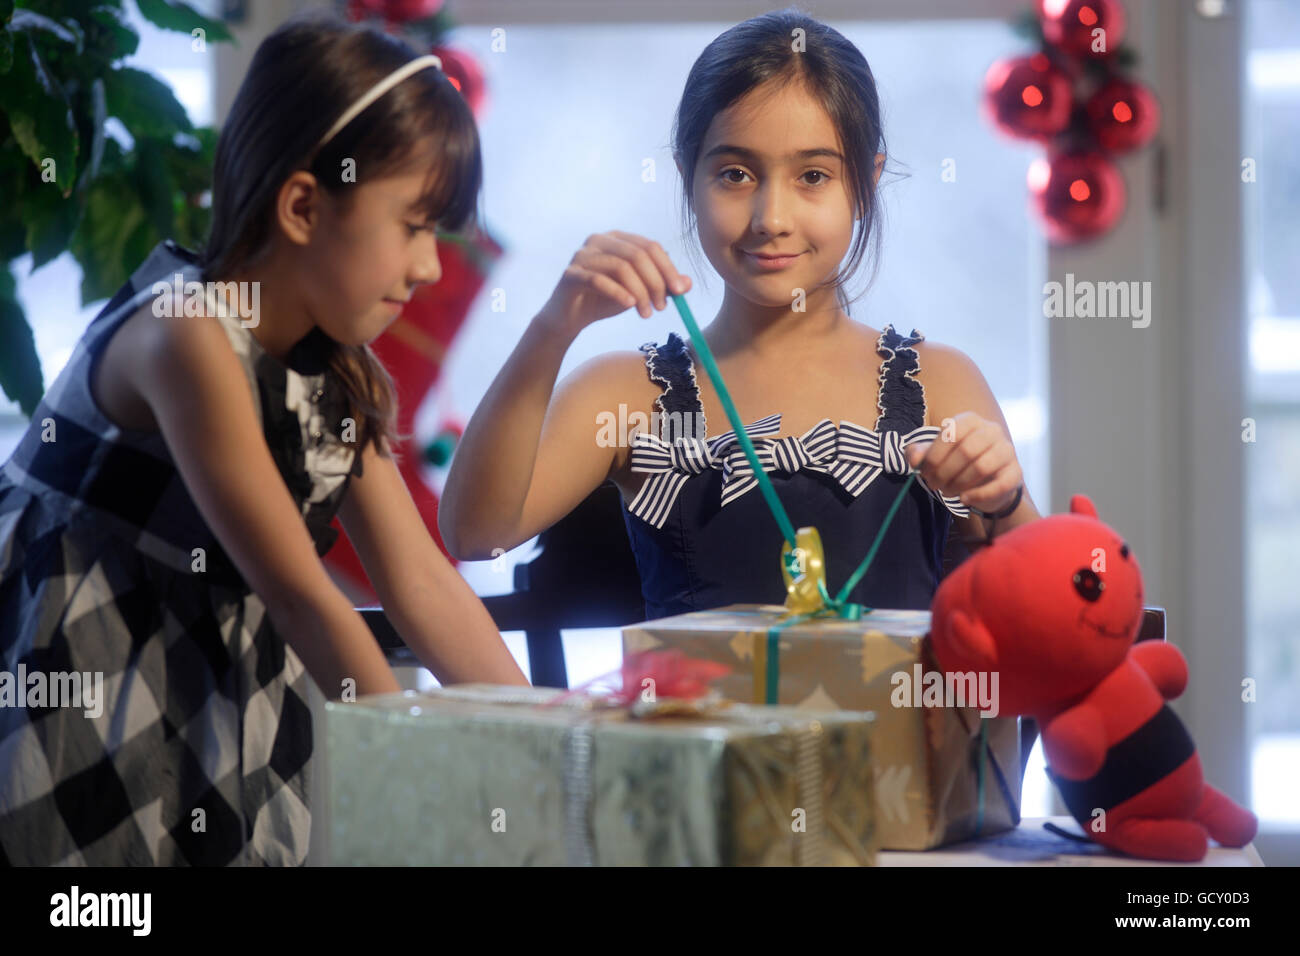 Elf Christmas Stockfotos & Elf Christmas Bilder - Alamy